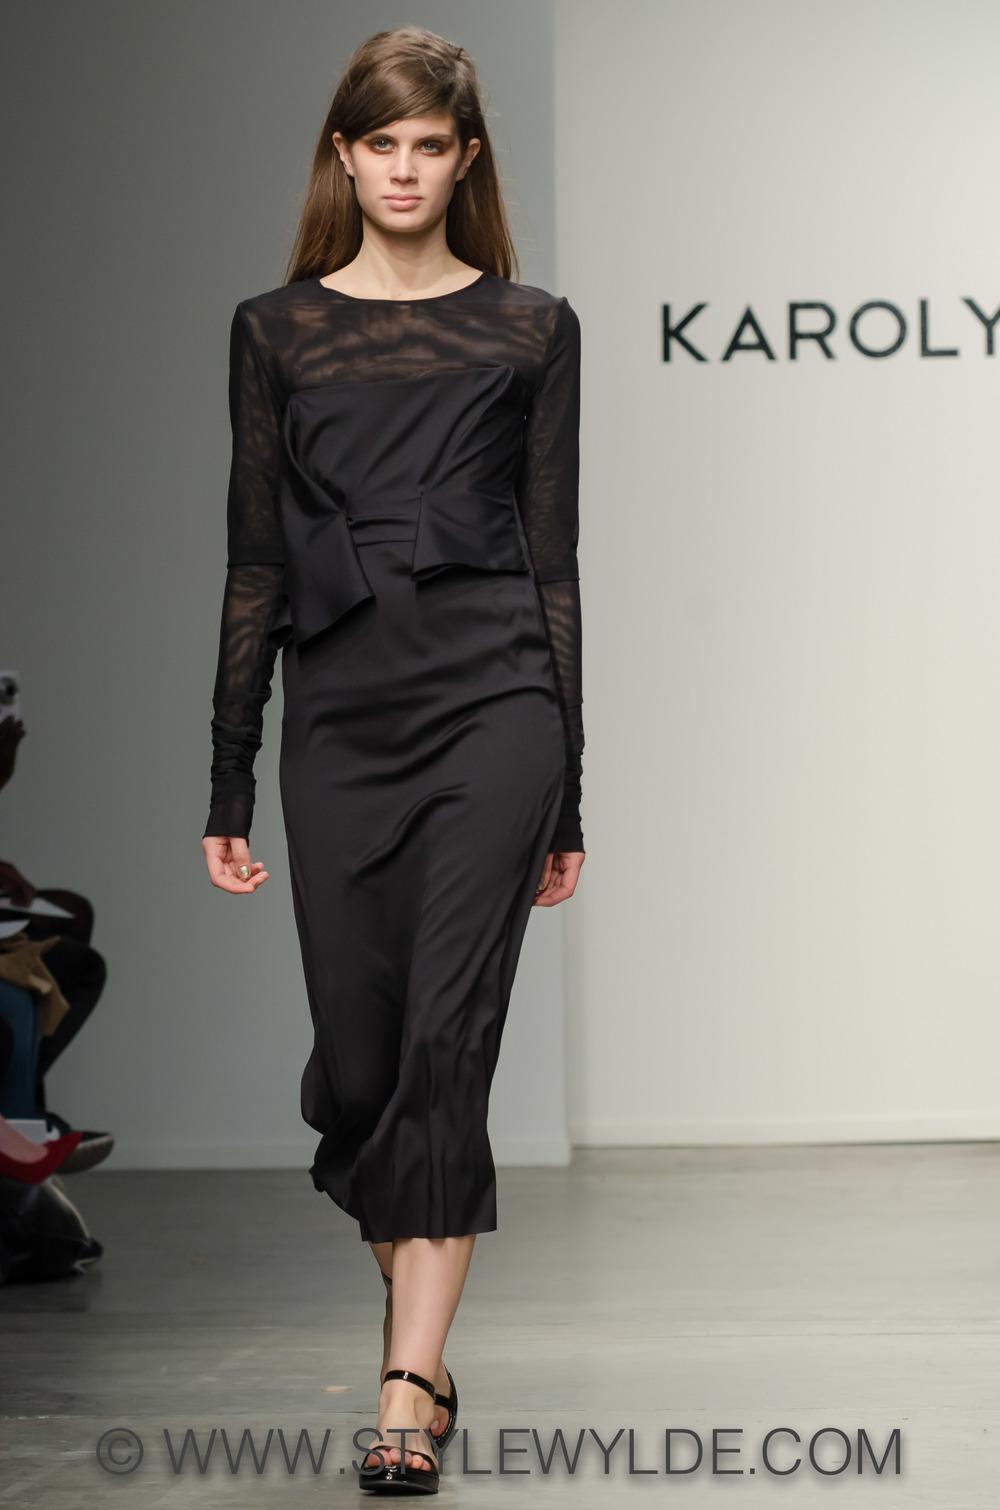 Stylewylde_KarolynPho_FOH_Bkstg_Story 22 of 26.jpg